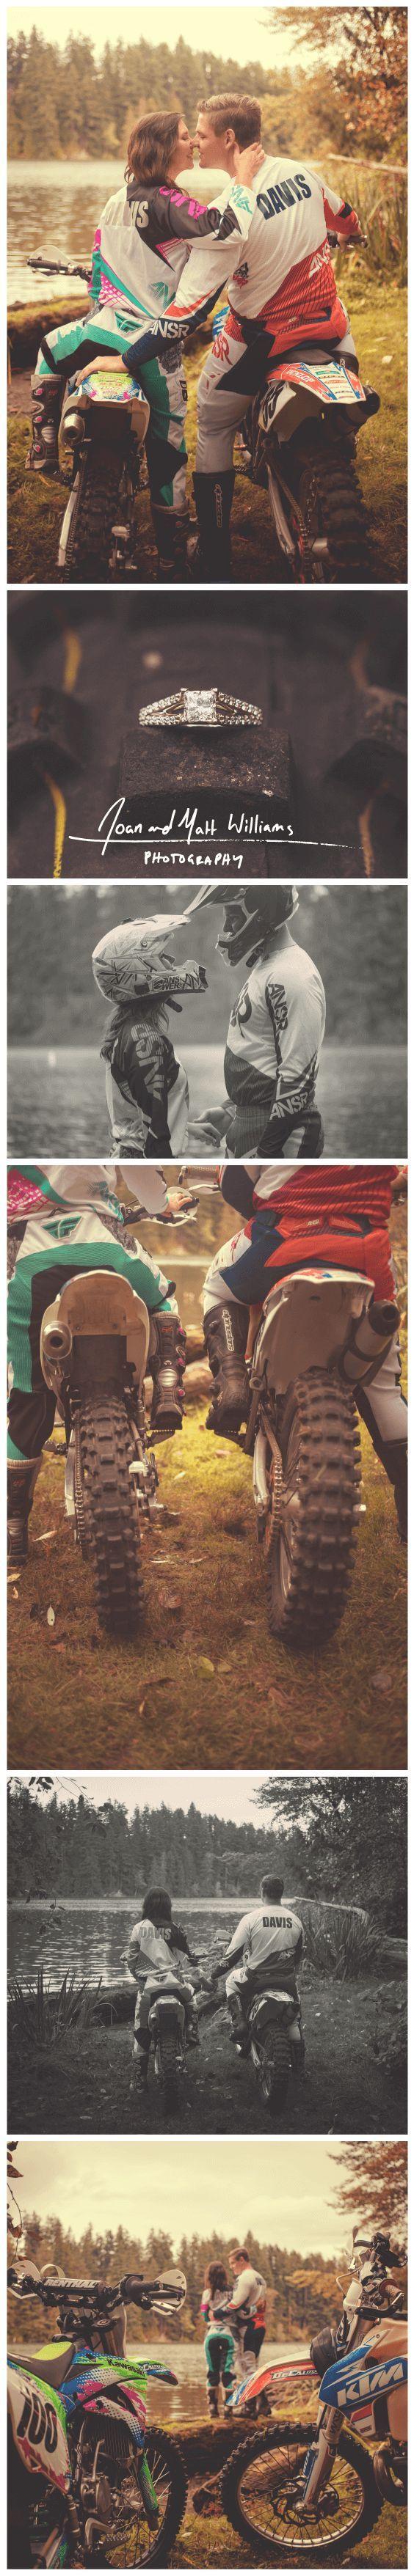 Motocross Autumn Engagement Photos with Dirt Bikes